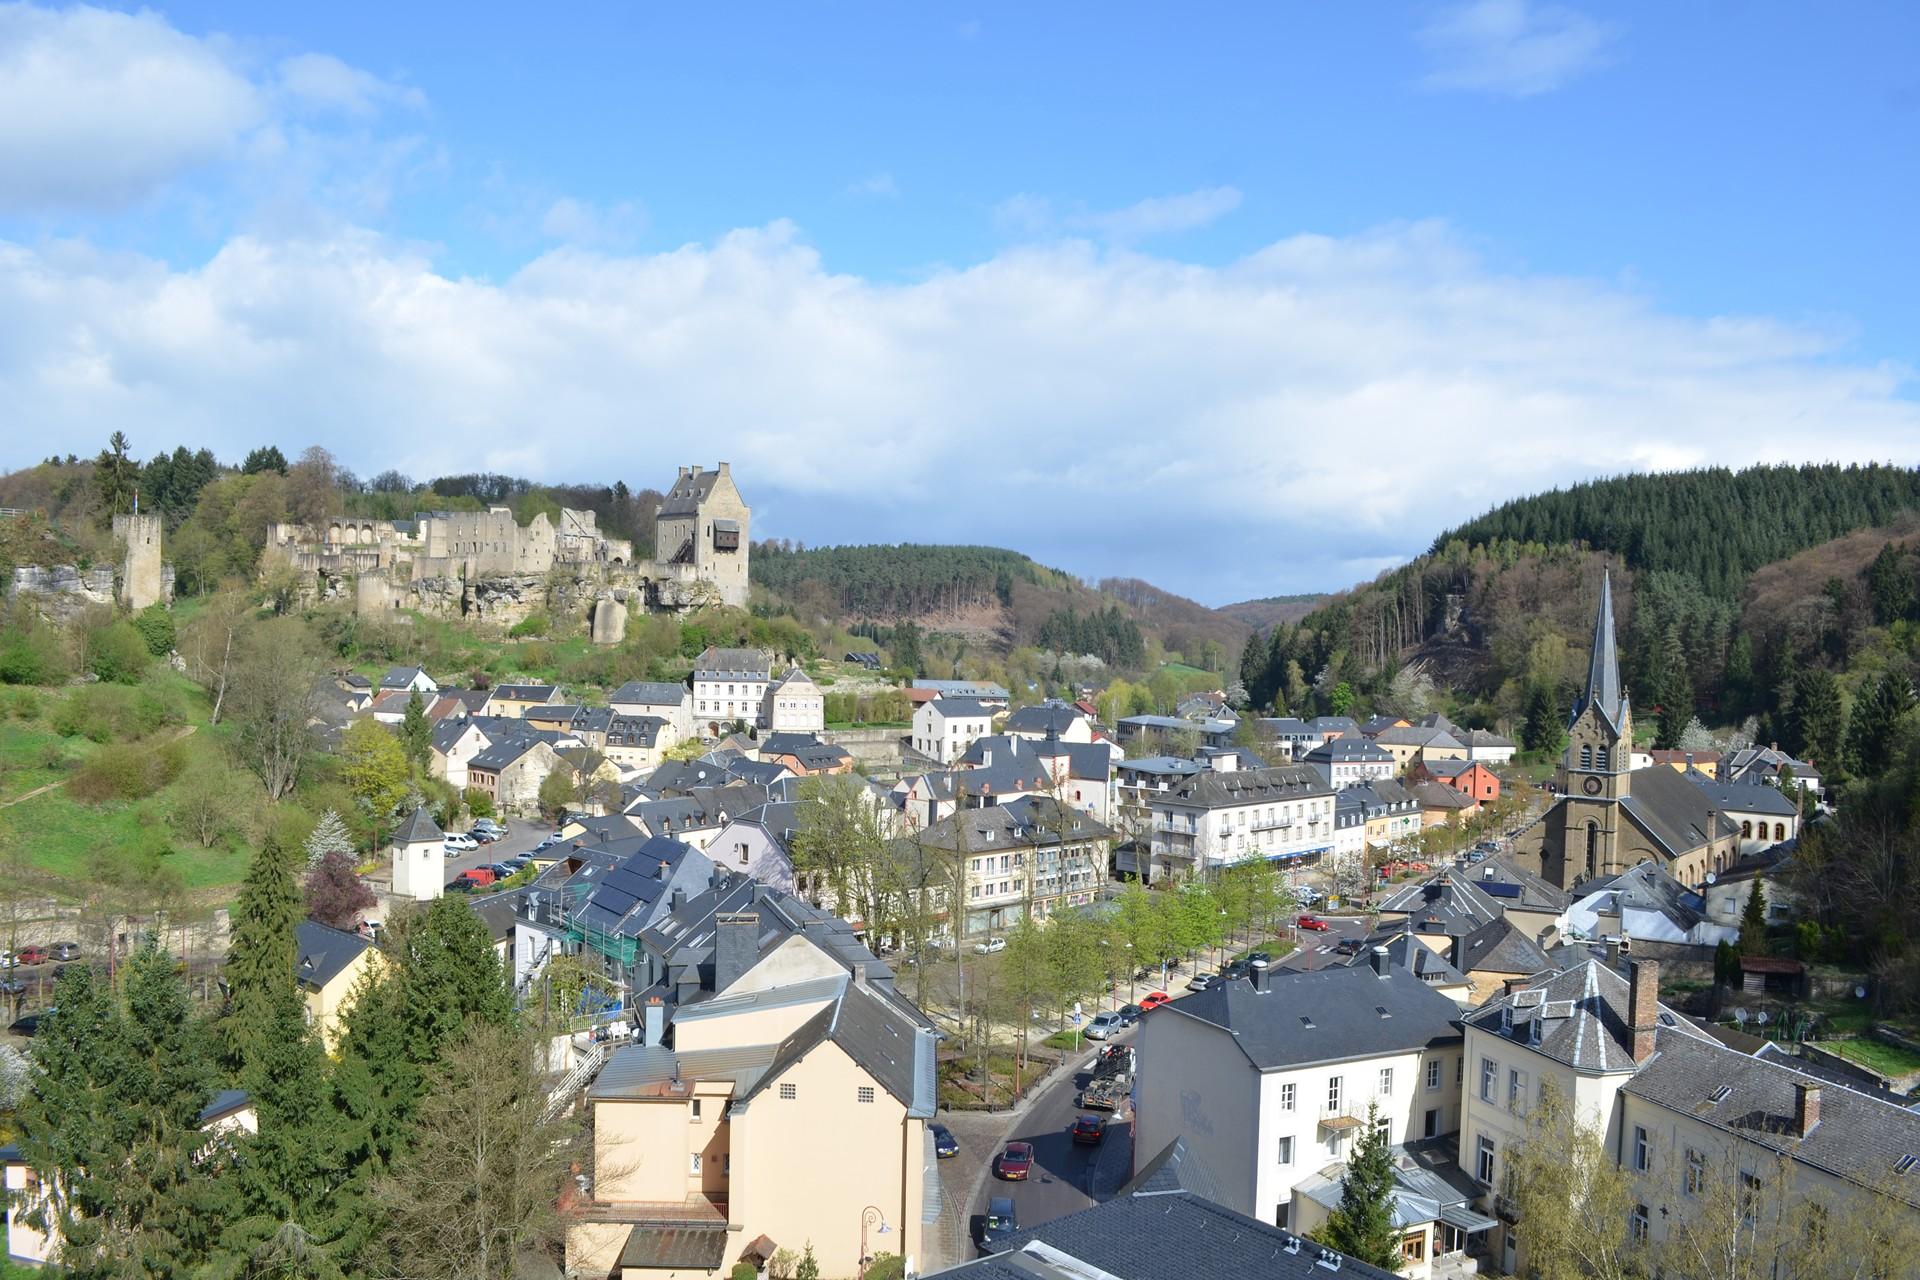 Vakantie larochette tui for Vakantie luxemburg